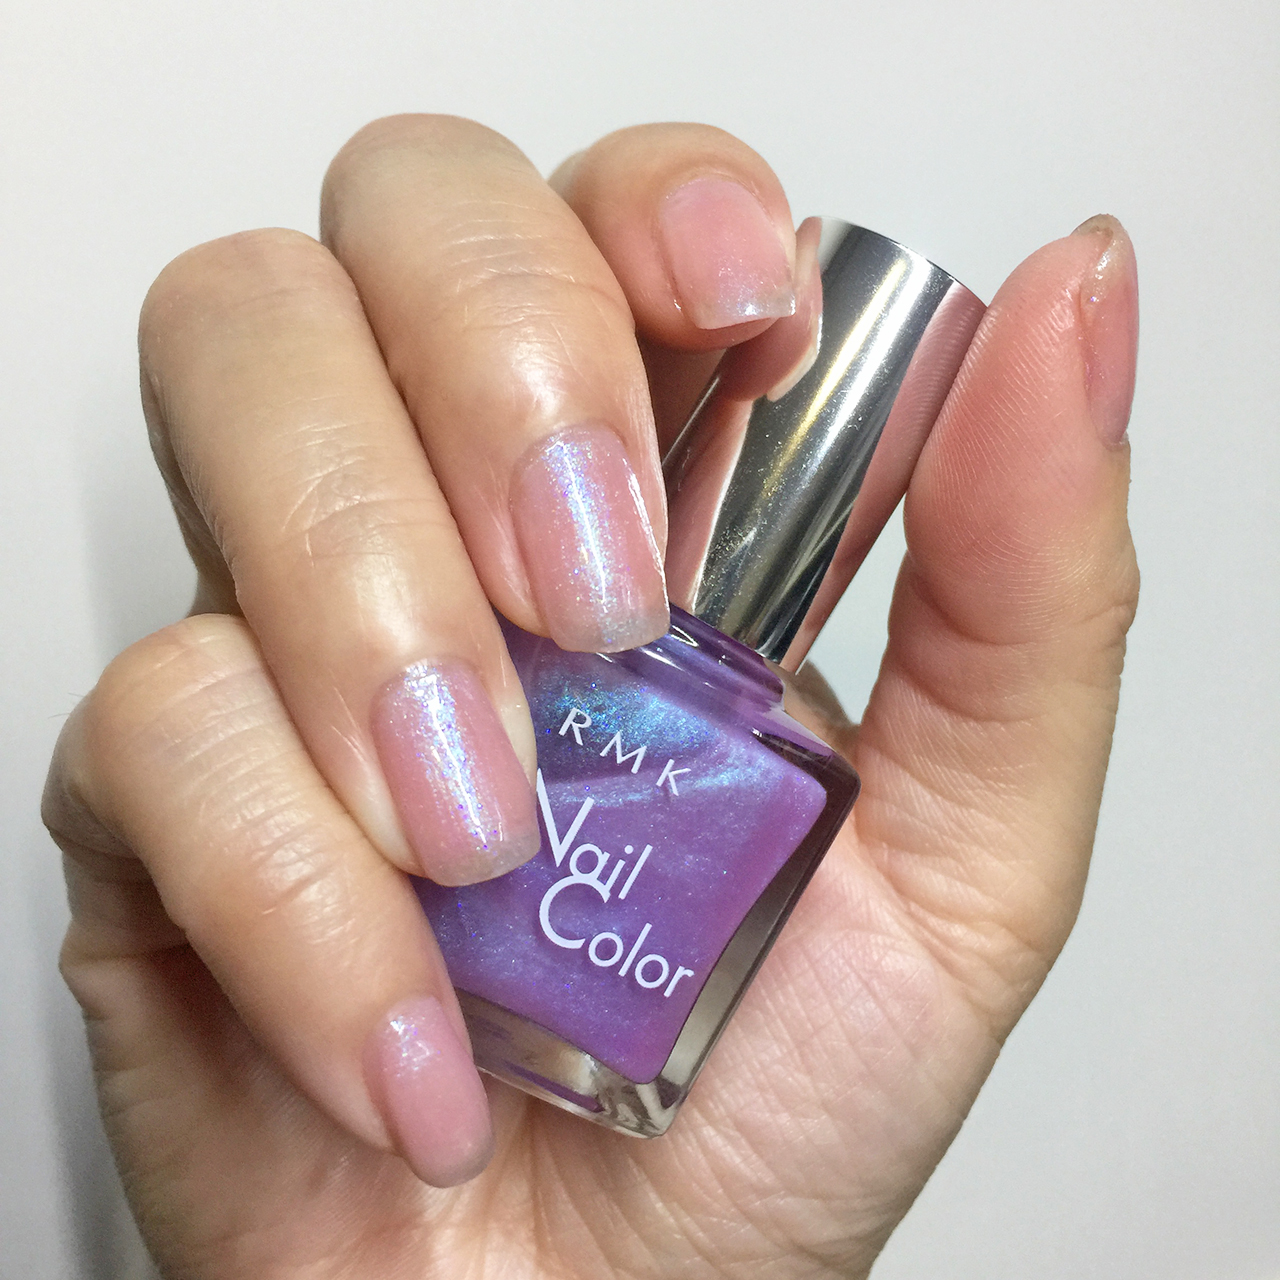 RMK Christmas Kit 2016 nail polish swatch